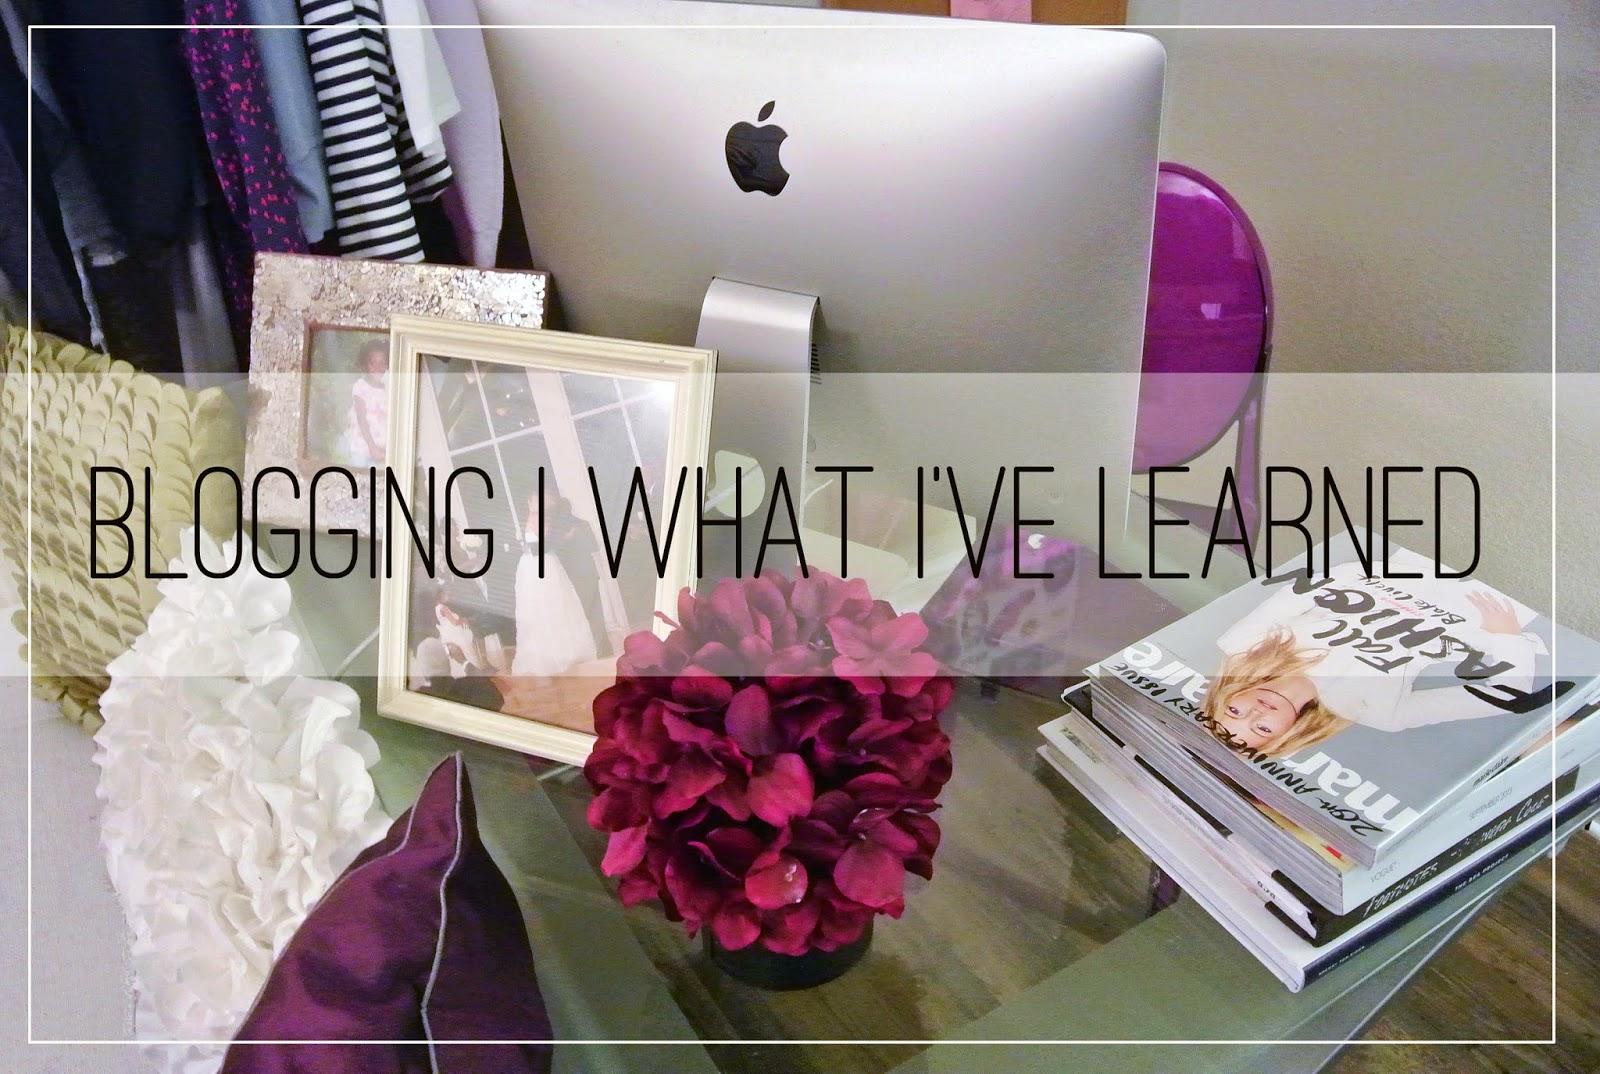 Blogging tips, plus size blogging tips